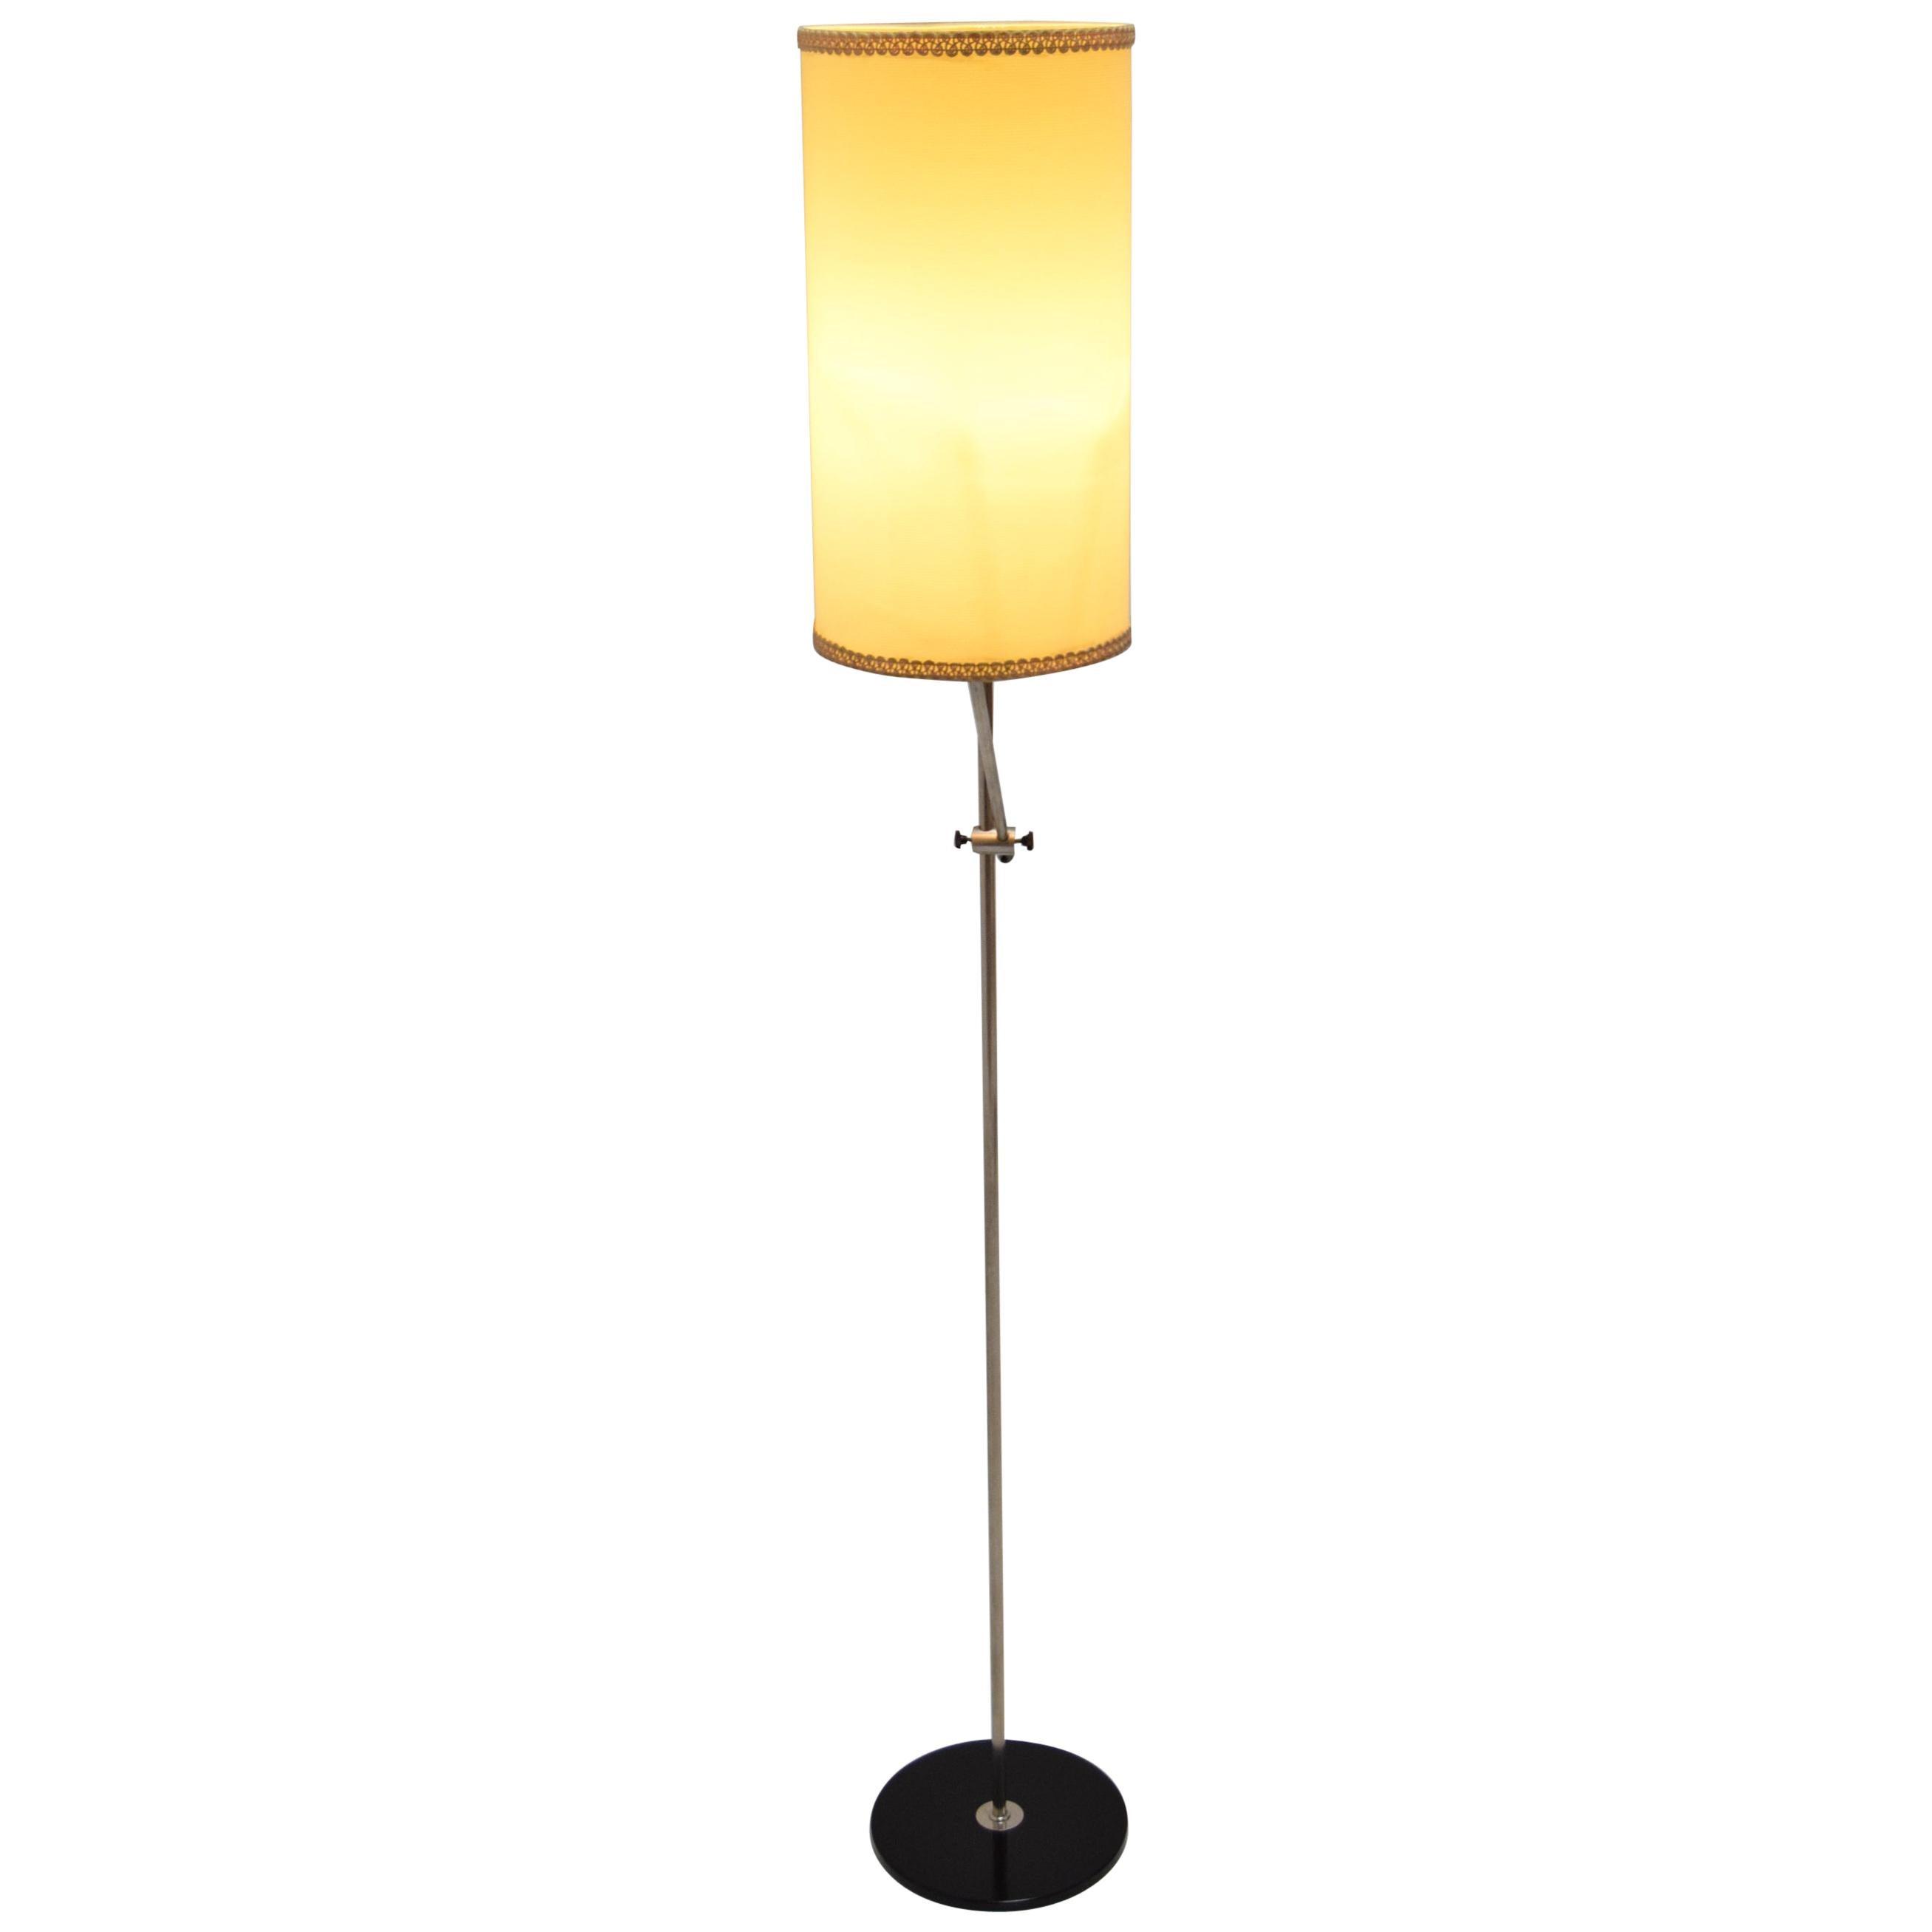 Midcentury Adjustable Floor Lamp by AKA Elektrik, 1970s